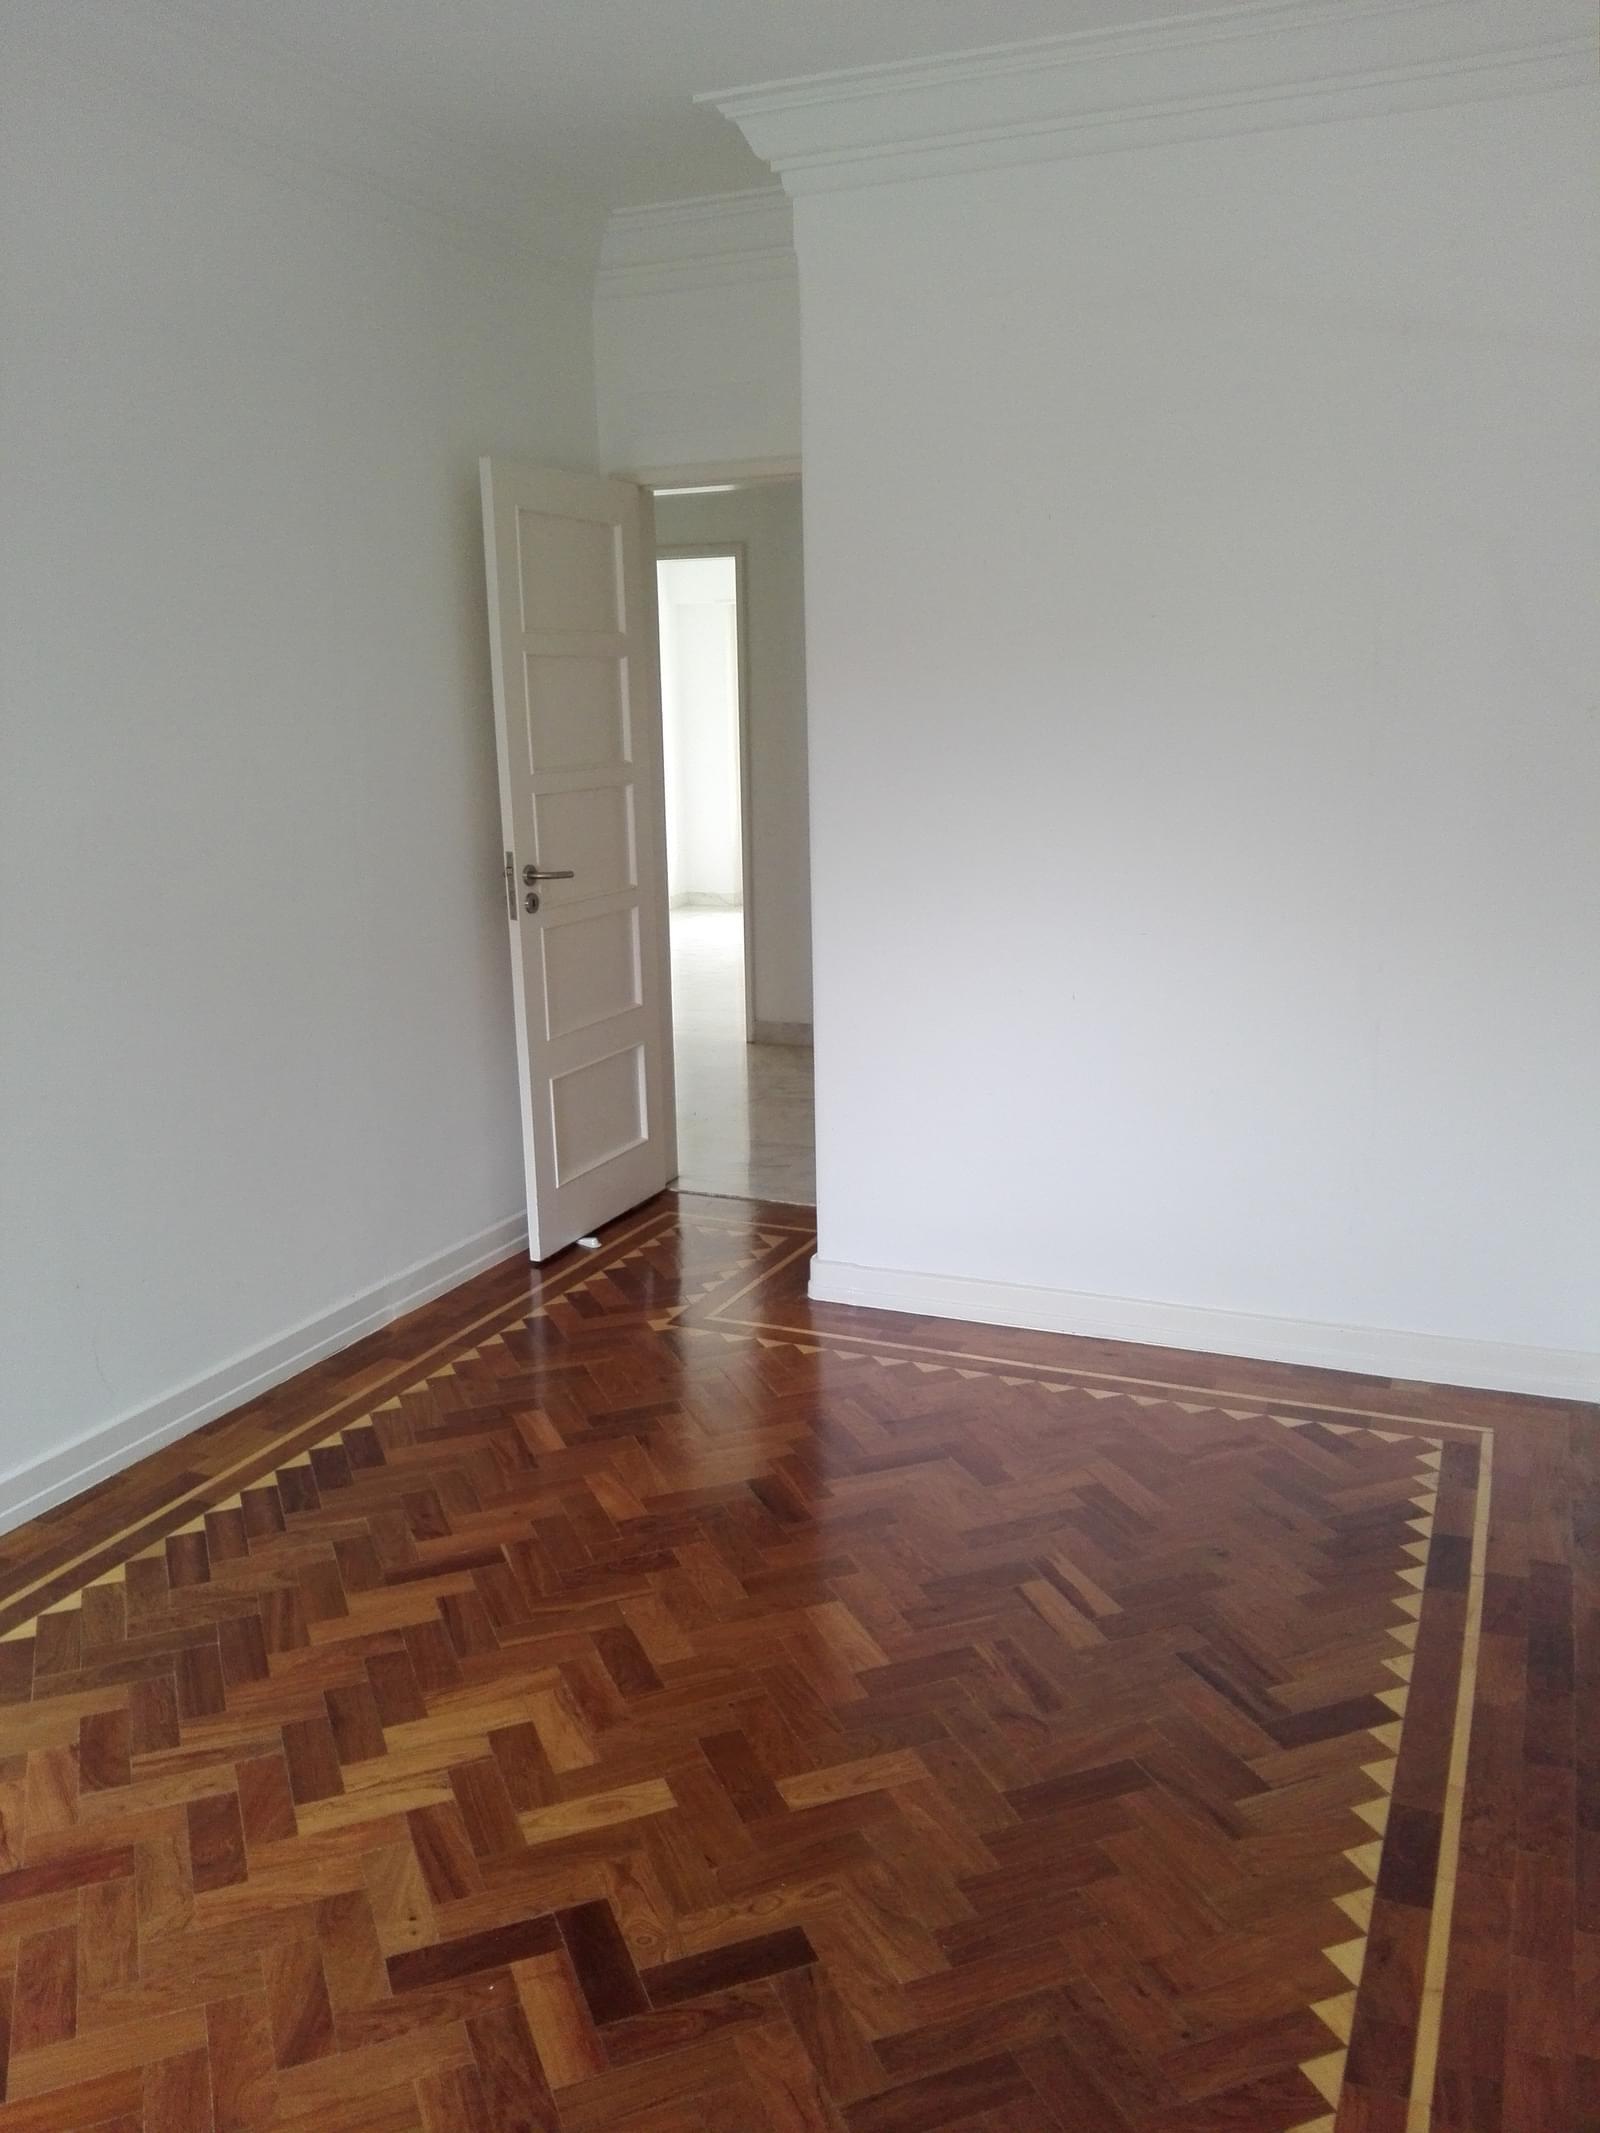 pf17056-apartamento-t4-1-lisboa-c5de4990-e40d-49eb-bb55-f2ef05a1f7d0